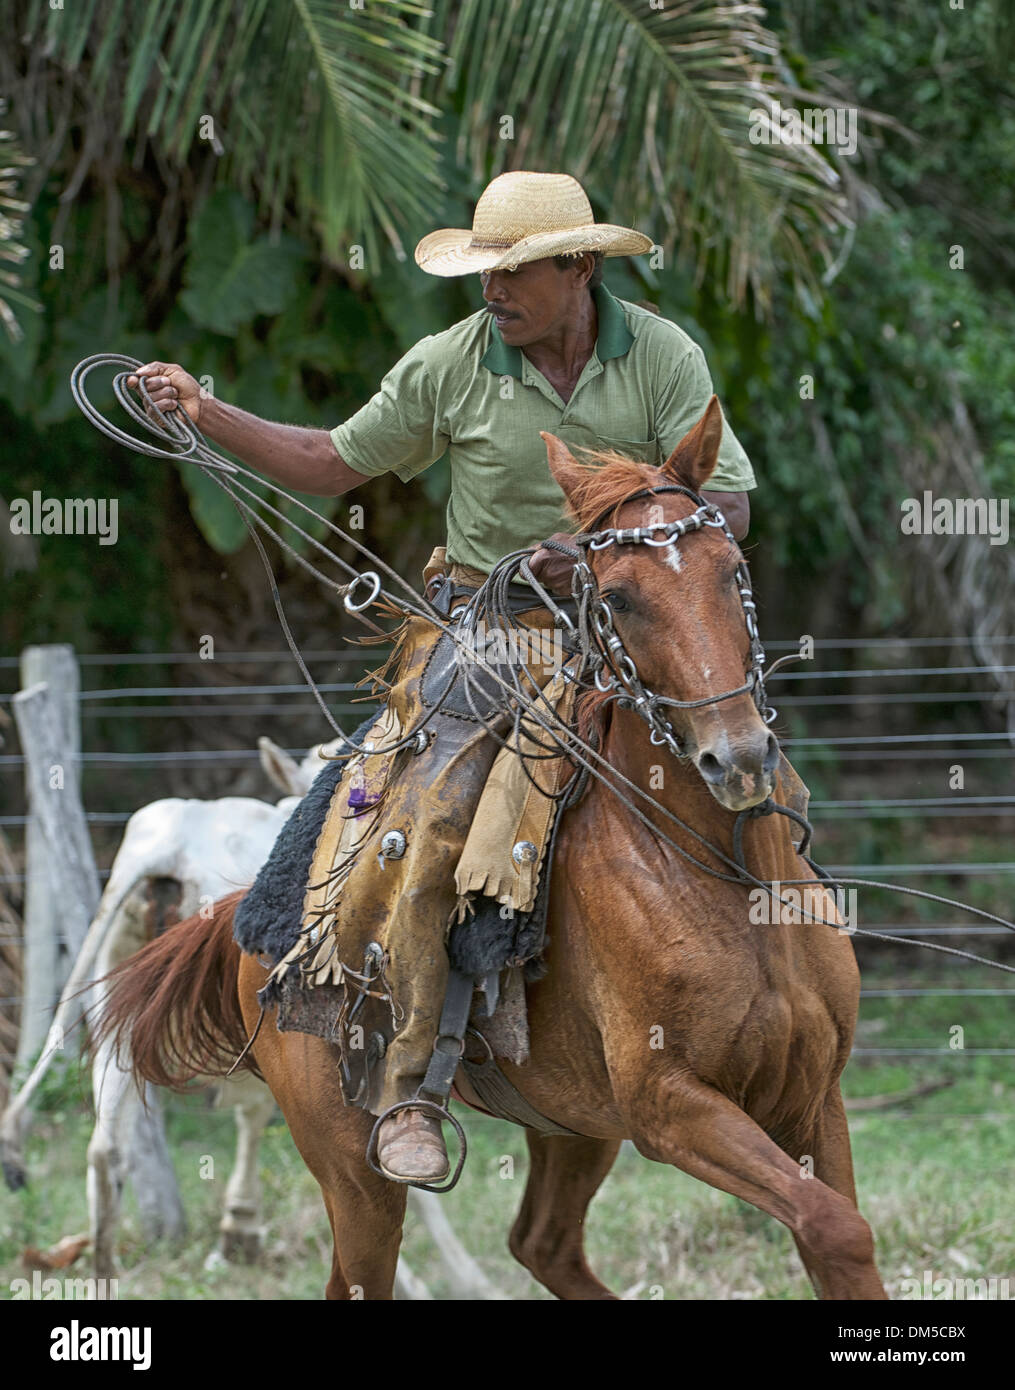 Pantaneiro cowboy with lasso, The Pantanal, Mato Grosso, Brazil - Stock Image